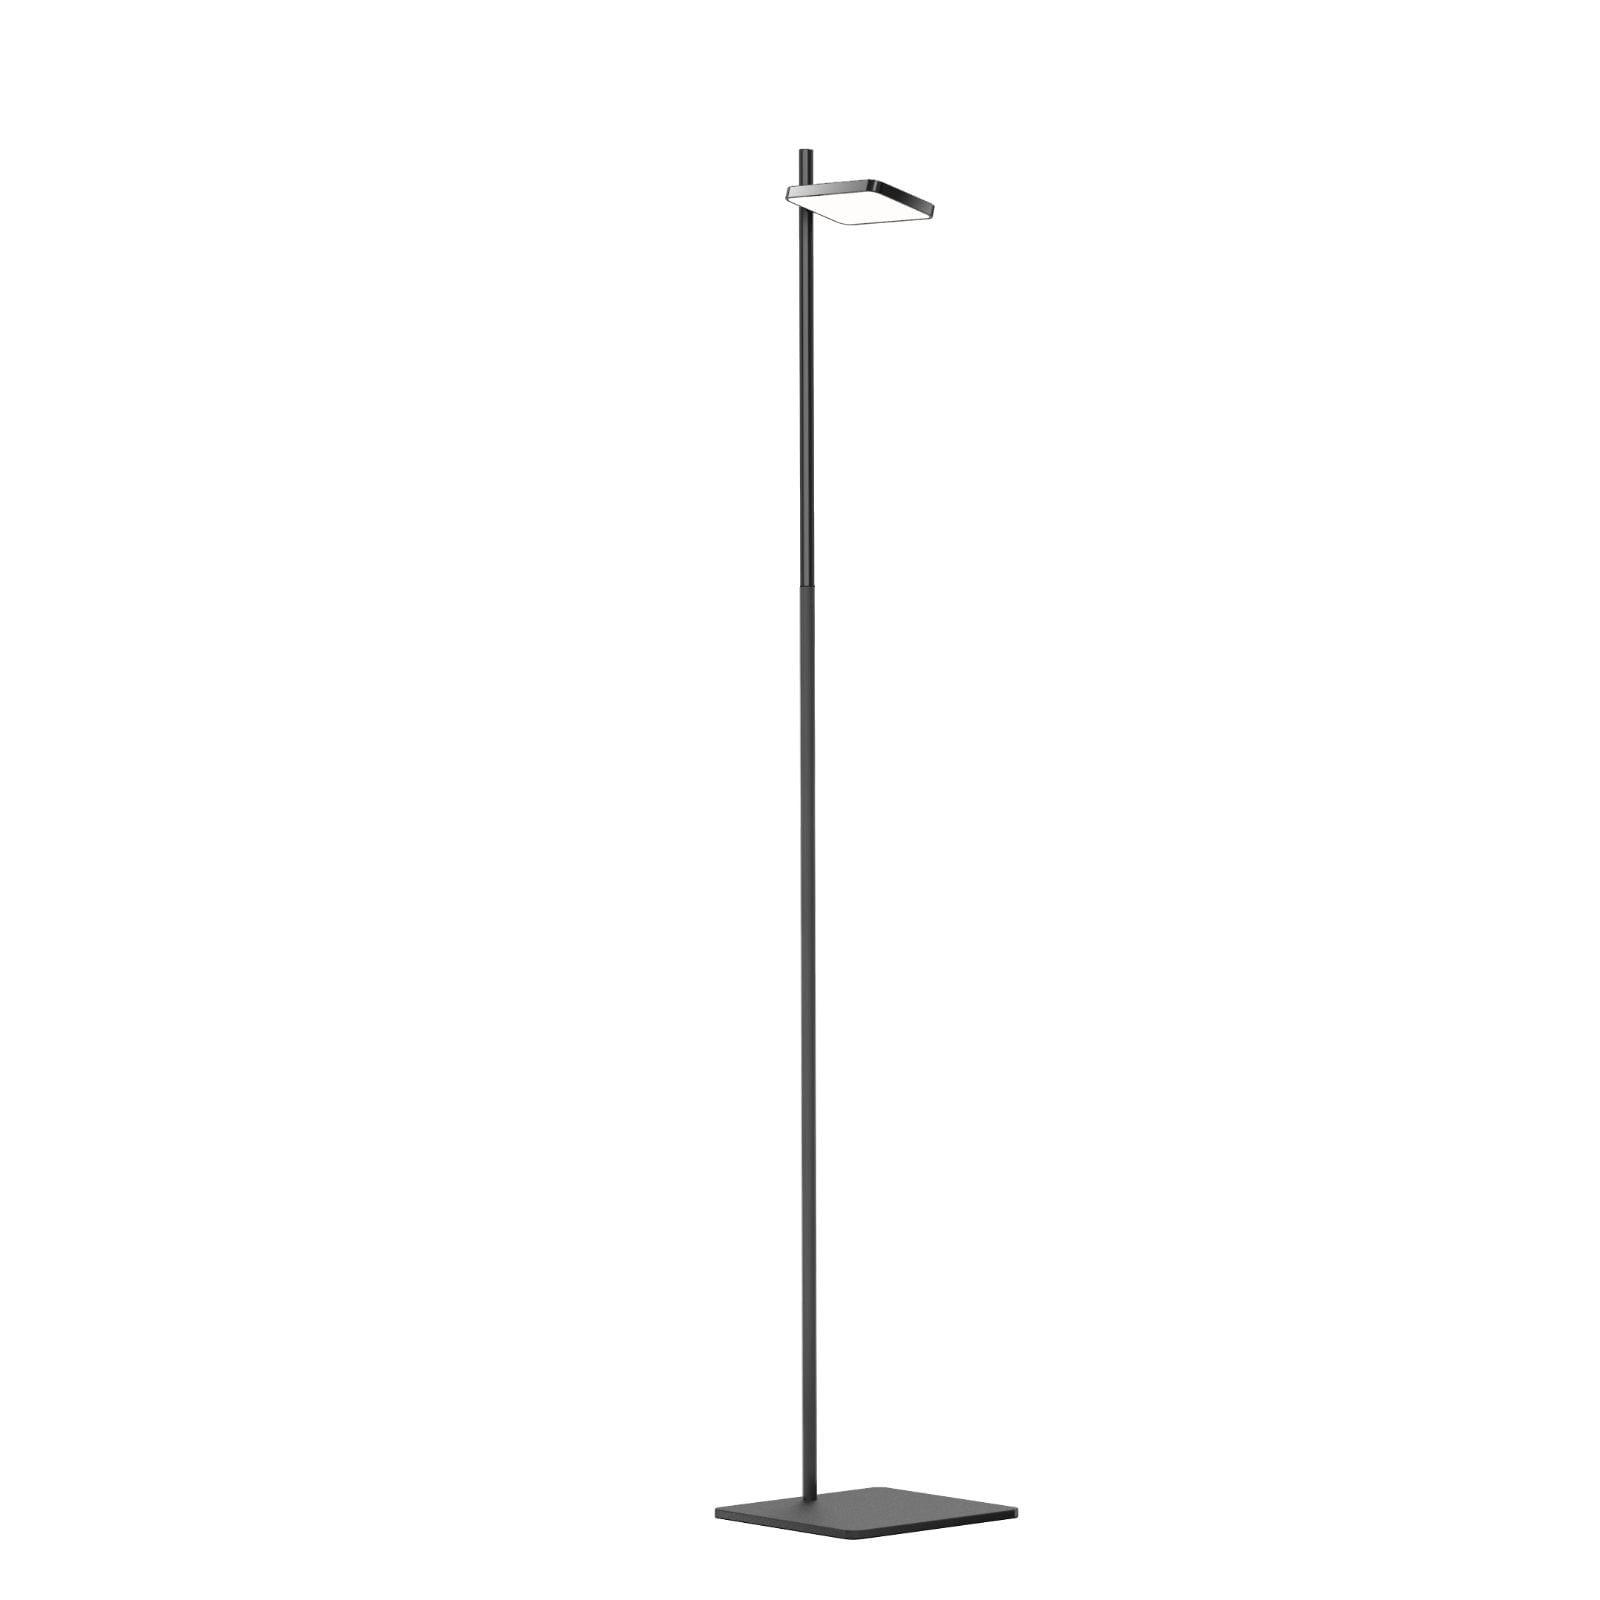 TALIA Φωτιστικό Δαπέδου LED (Μαύρο) - Pablo Designs